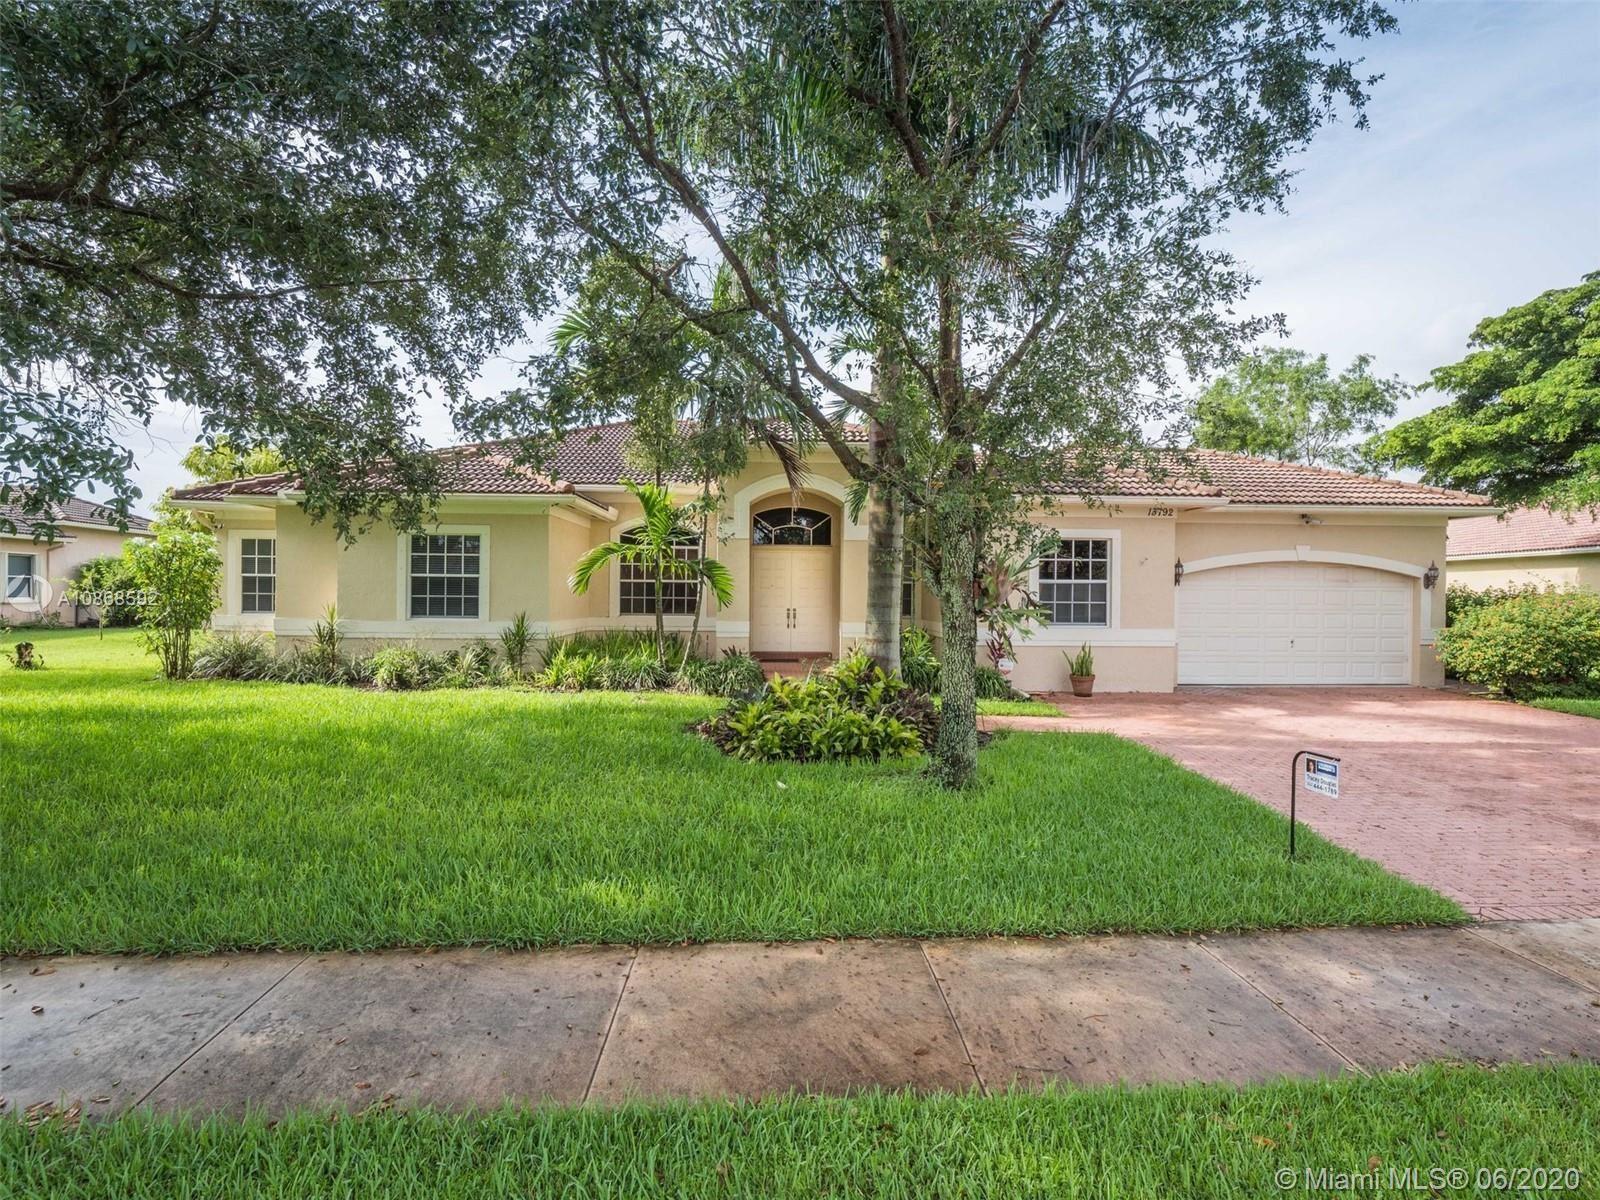 Photo of 13792 SW 40th St, Davie, FL 33330 (MLS # A10868592)